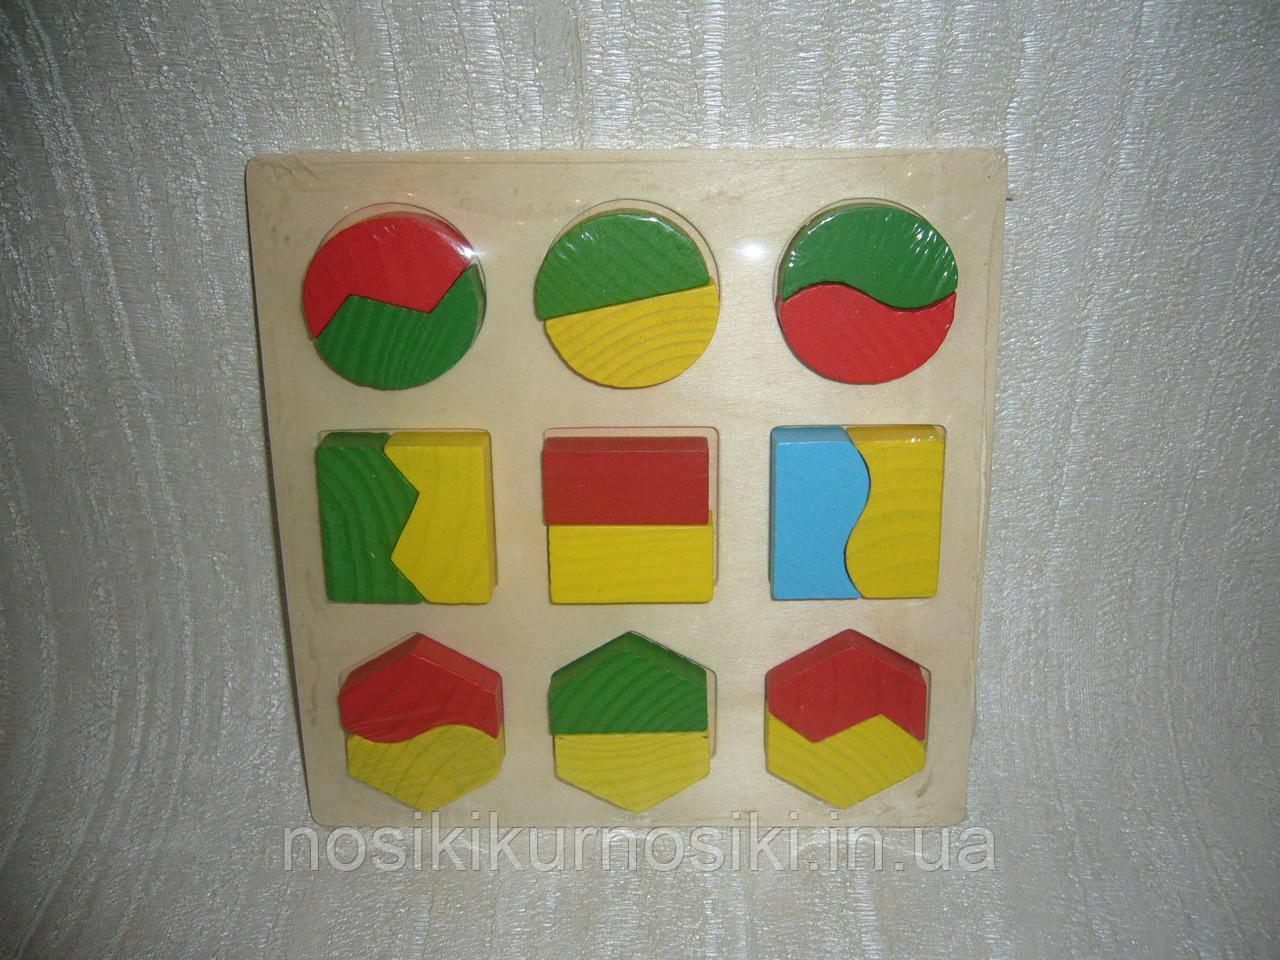 Деревянная игрушка Геометрика - половинки